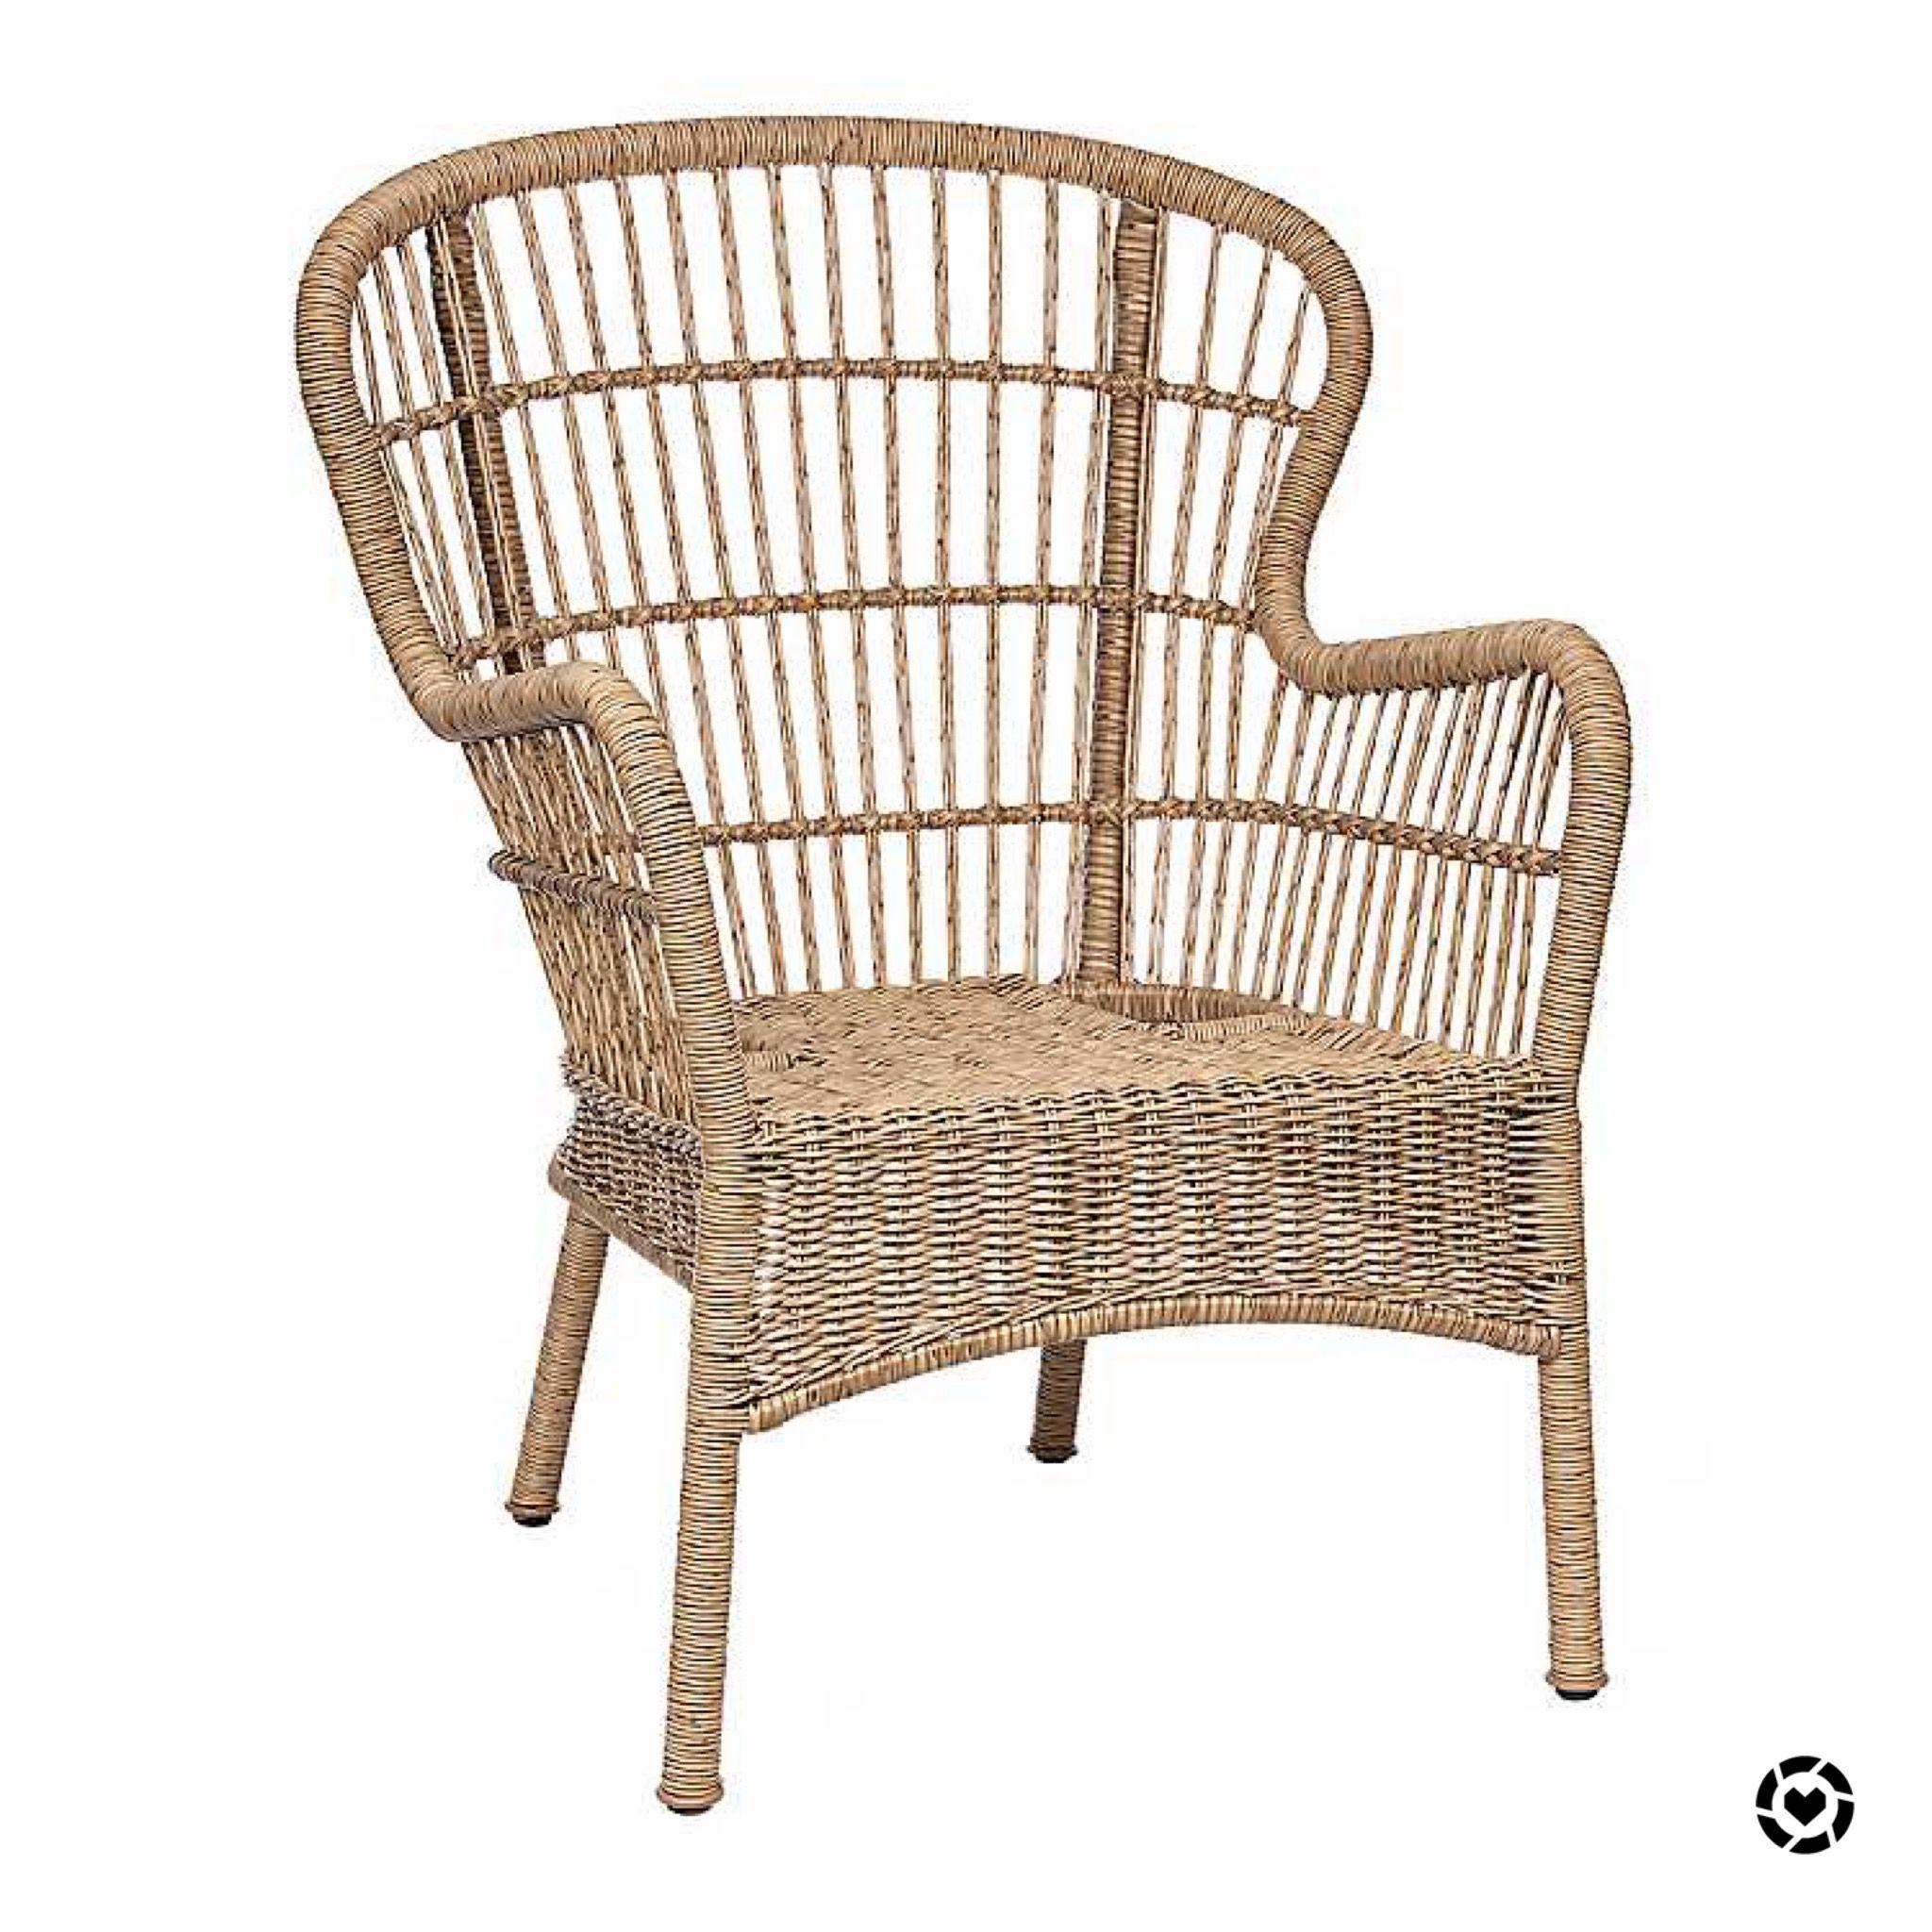 natural wicker outdoor chair outdoor